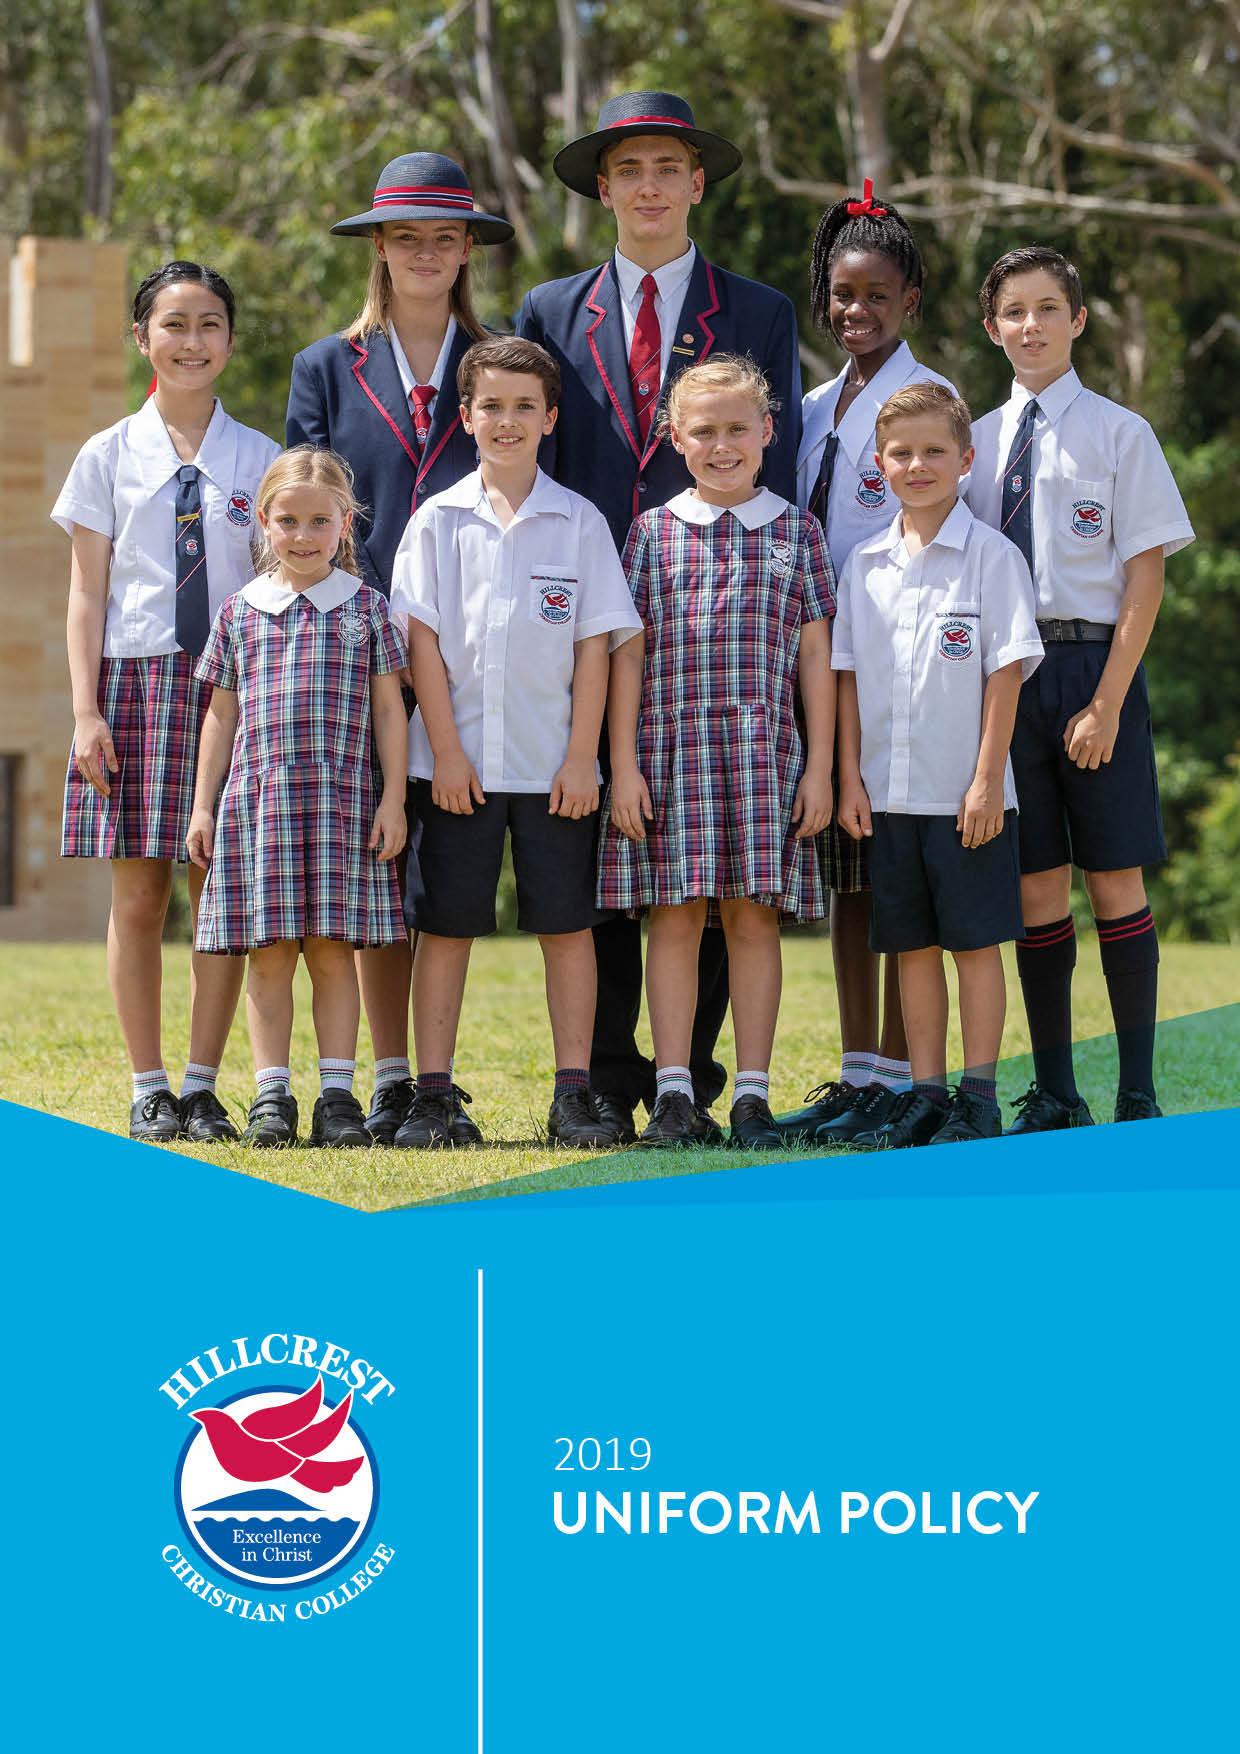 2019 Uniform Policy